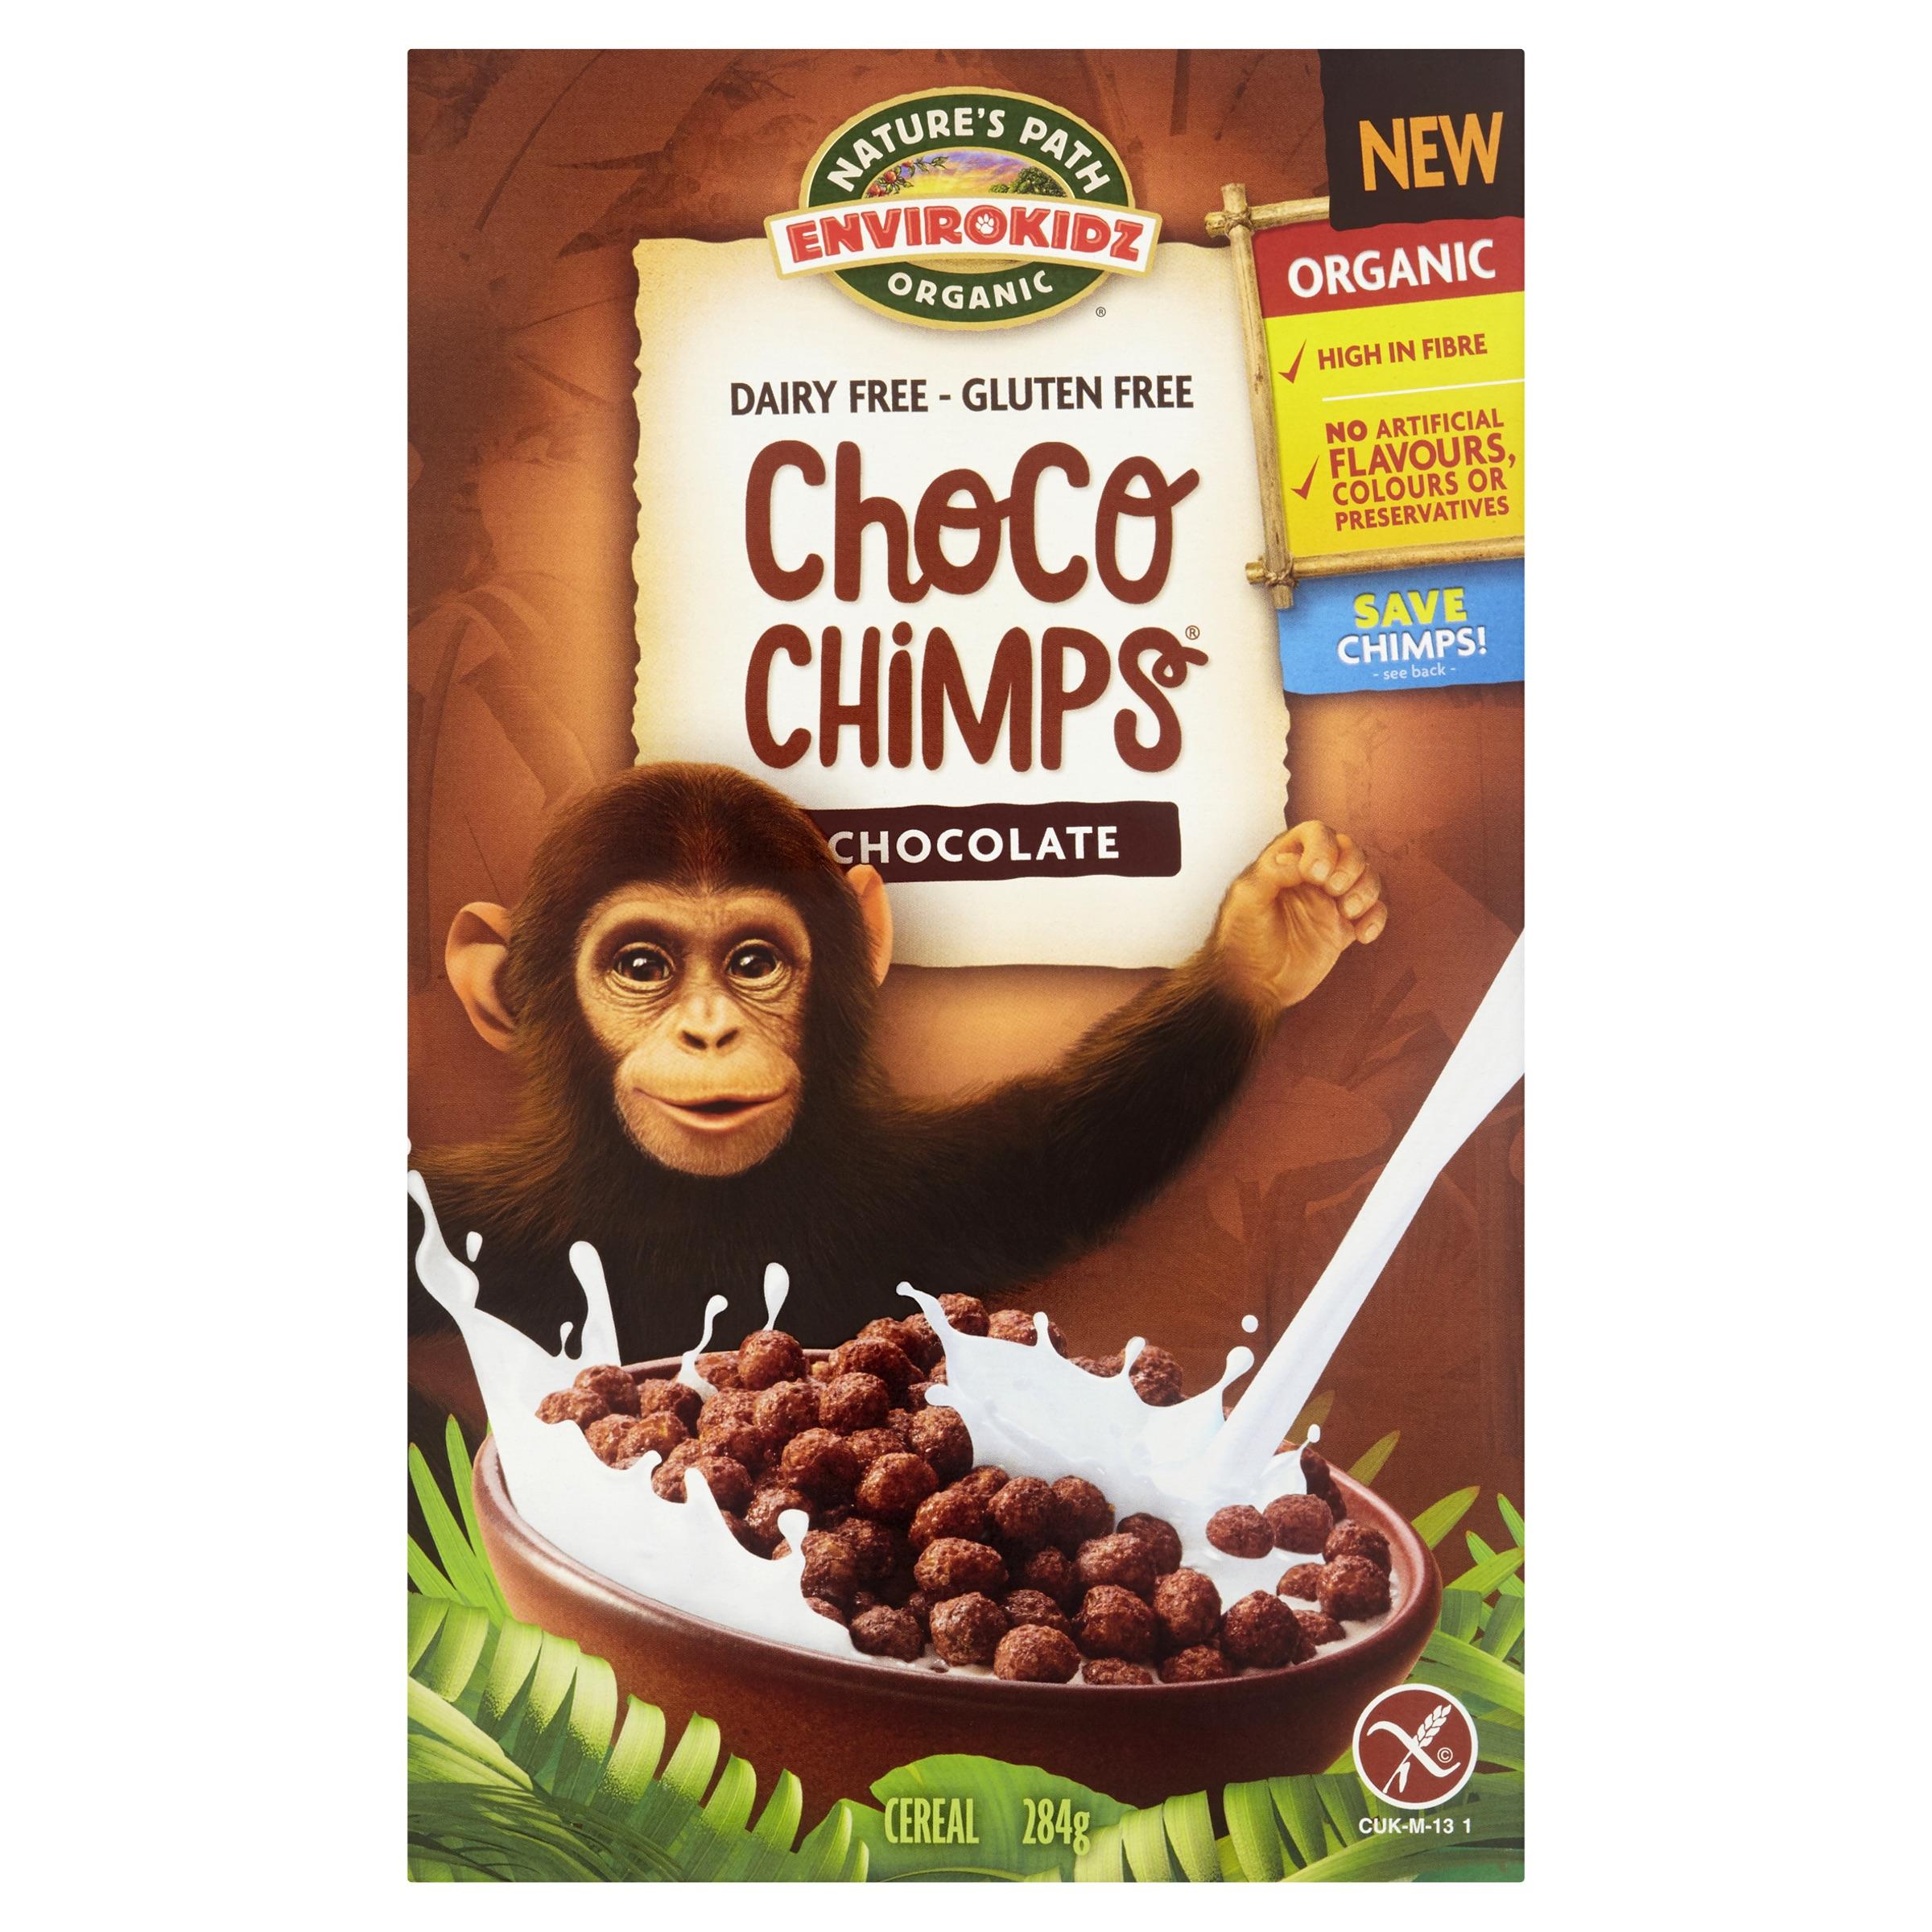 Choco Chimps.jpg